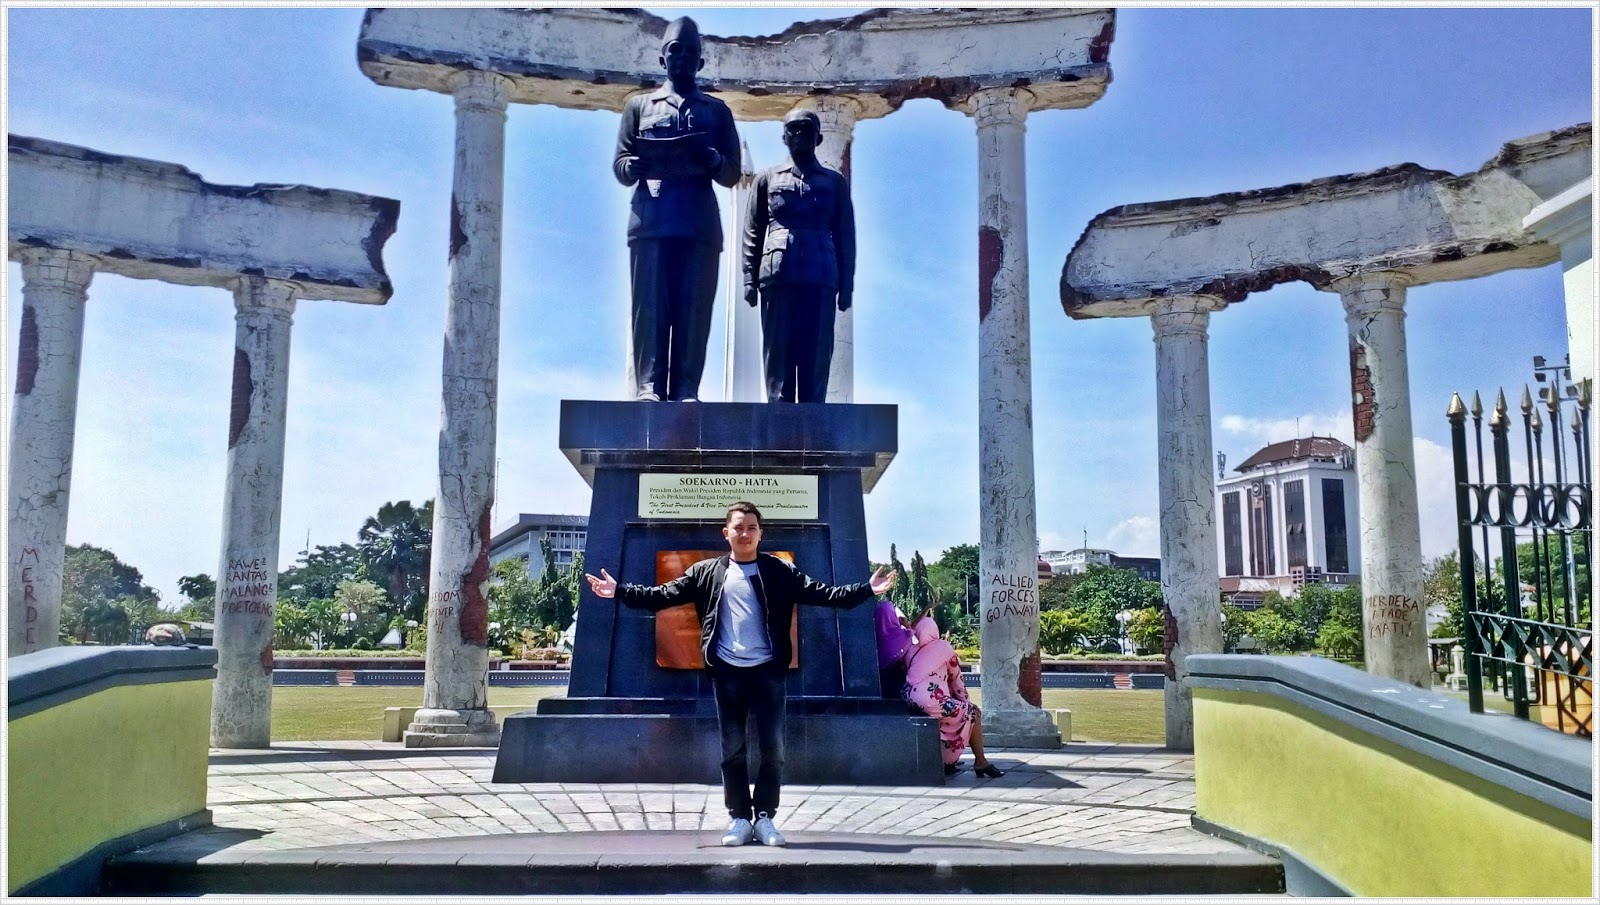 Melihat Lebih Dekat Monumen Tugu Pahlawan Surabaya Mister Pangalayo Sebenarnya